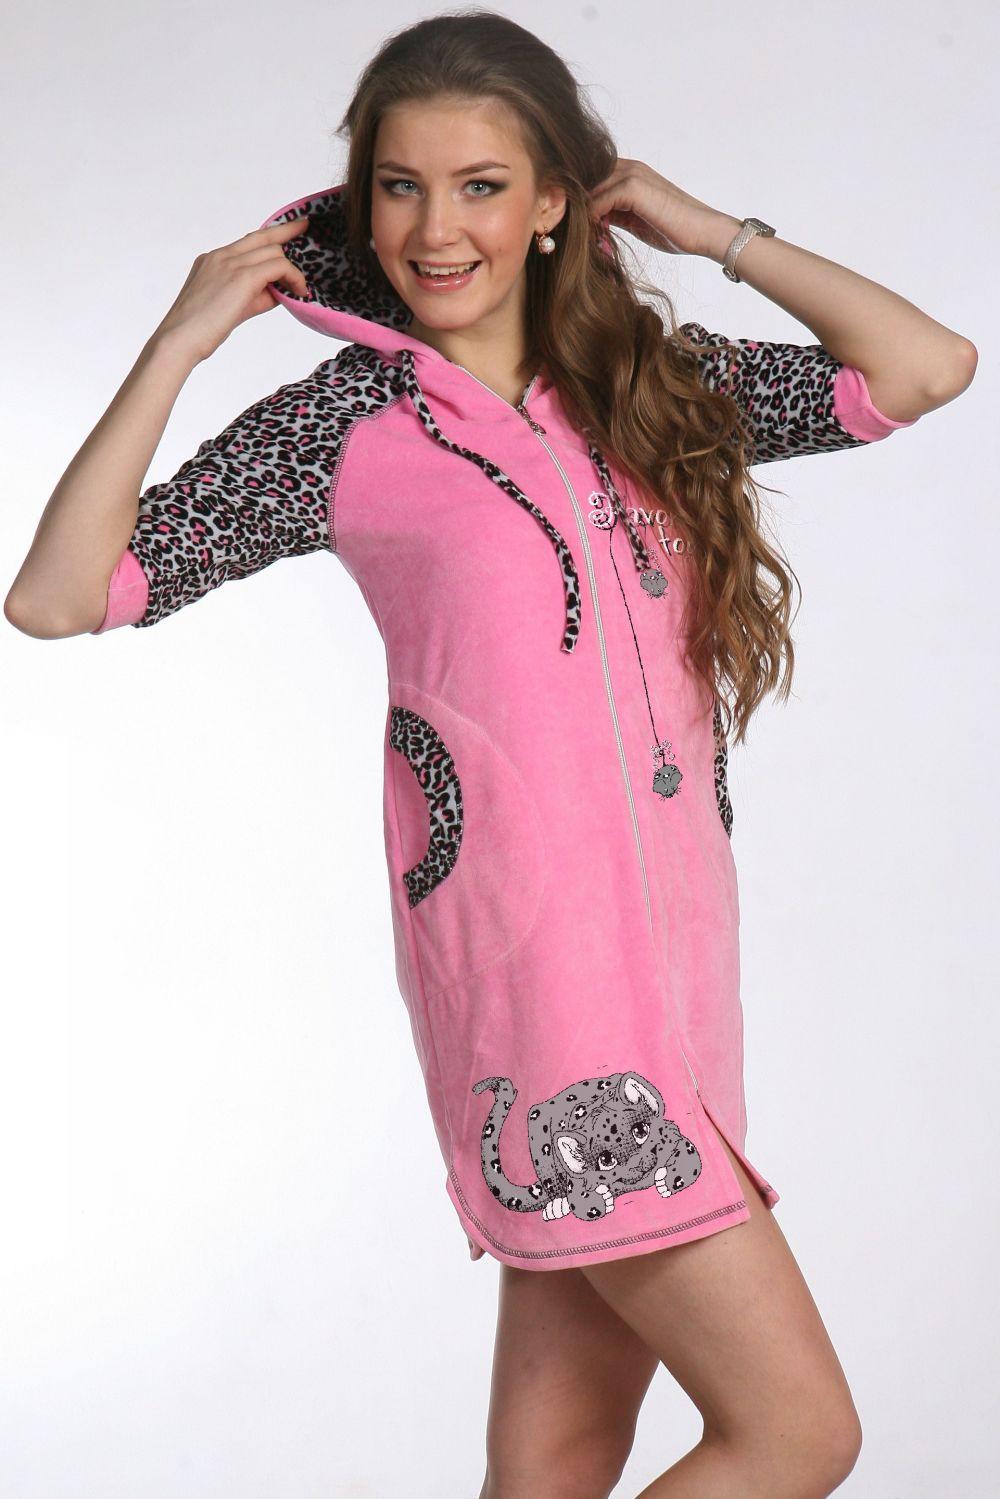 Халат женский Cheetah с капюшономКоллекция ВЕСНА-ЛЕТО<br><br><br>Размер: 44